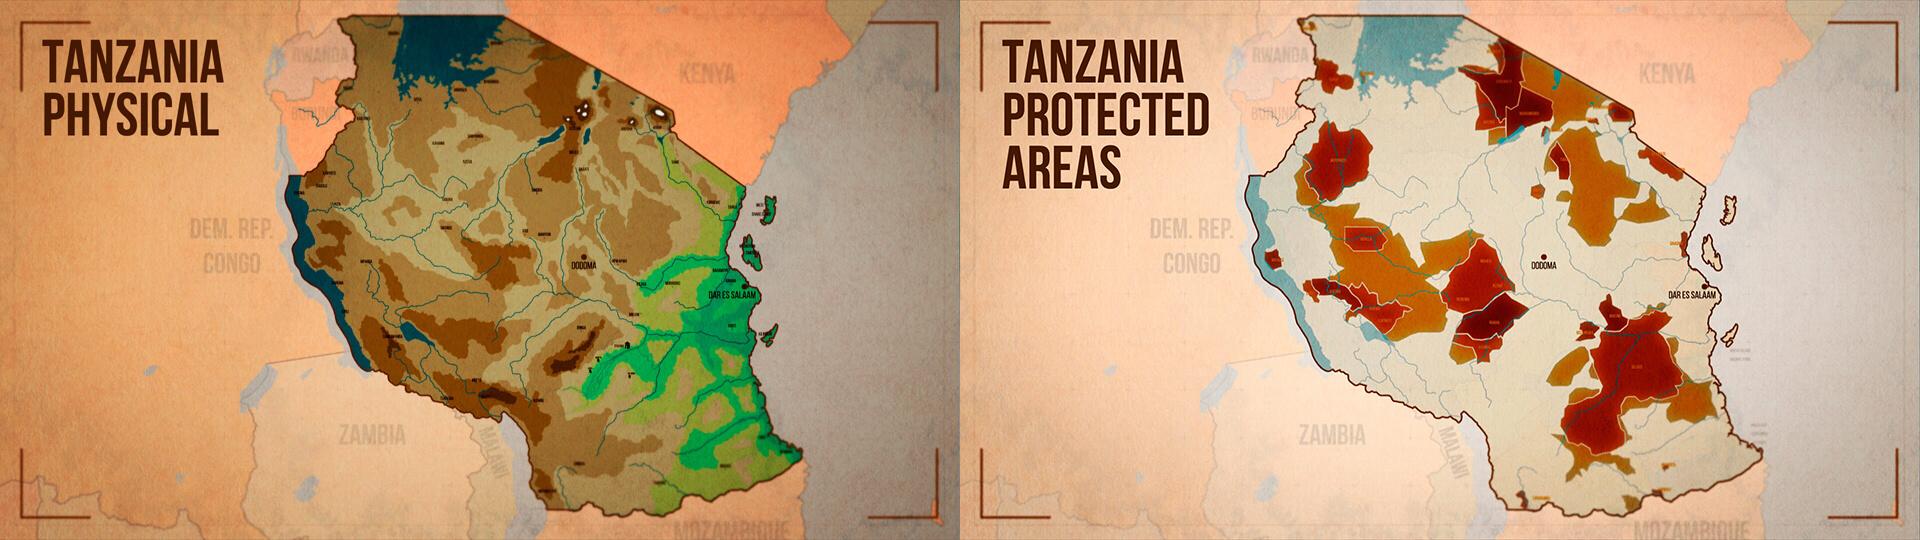 Tanzania_Map_4